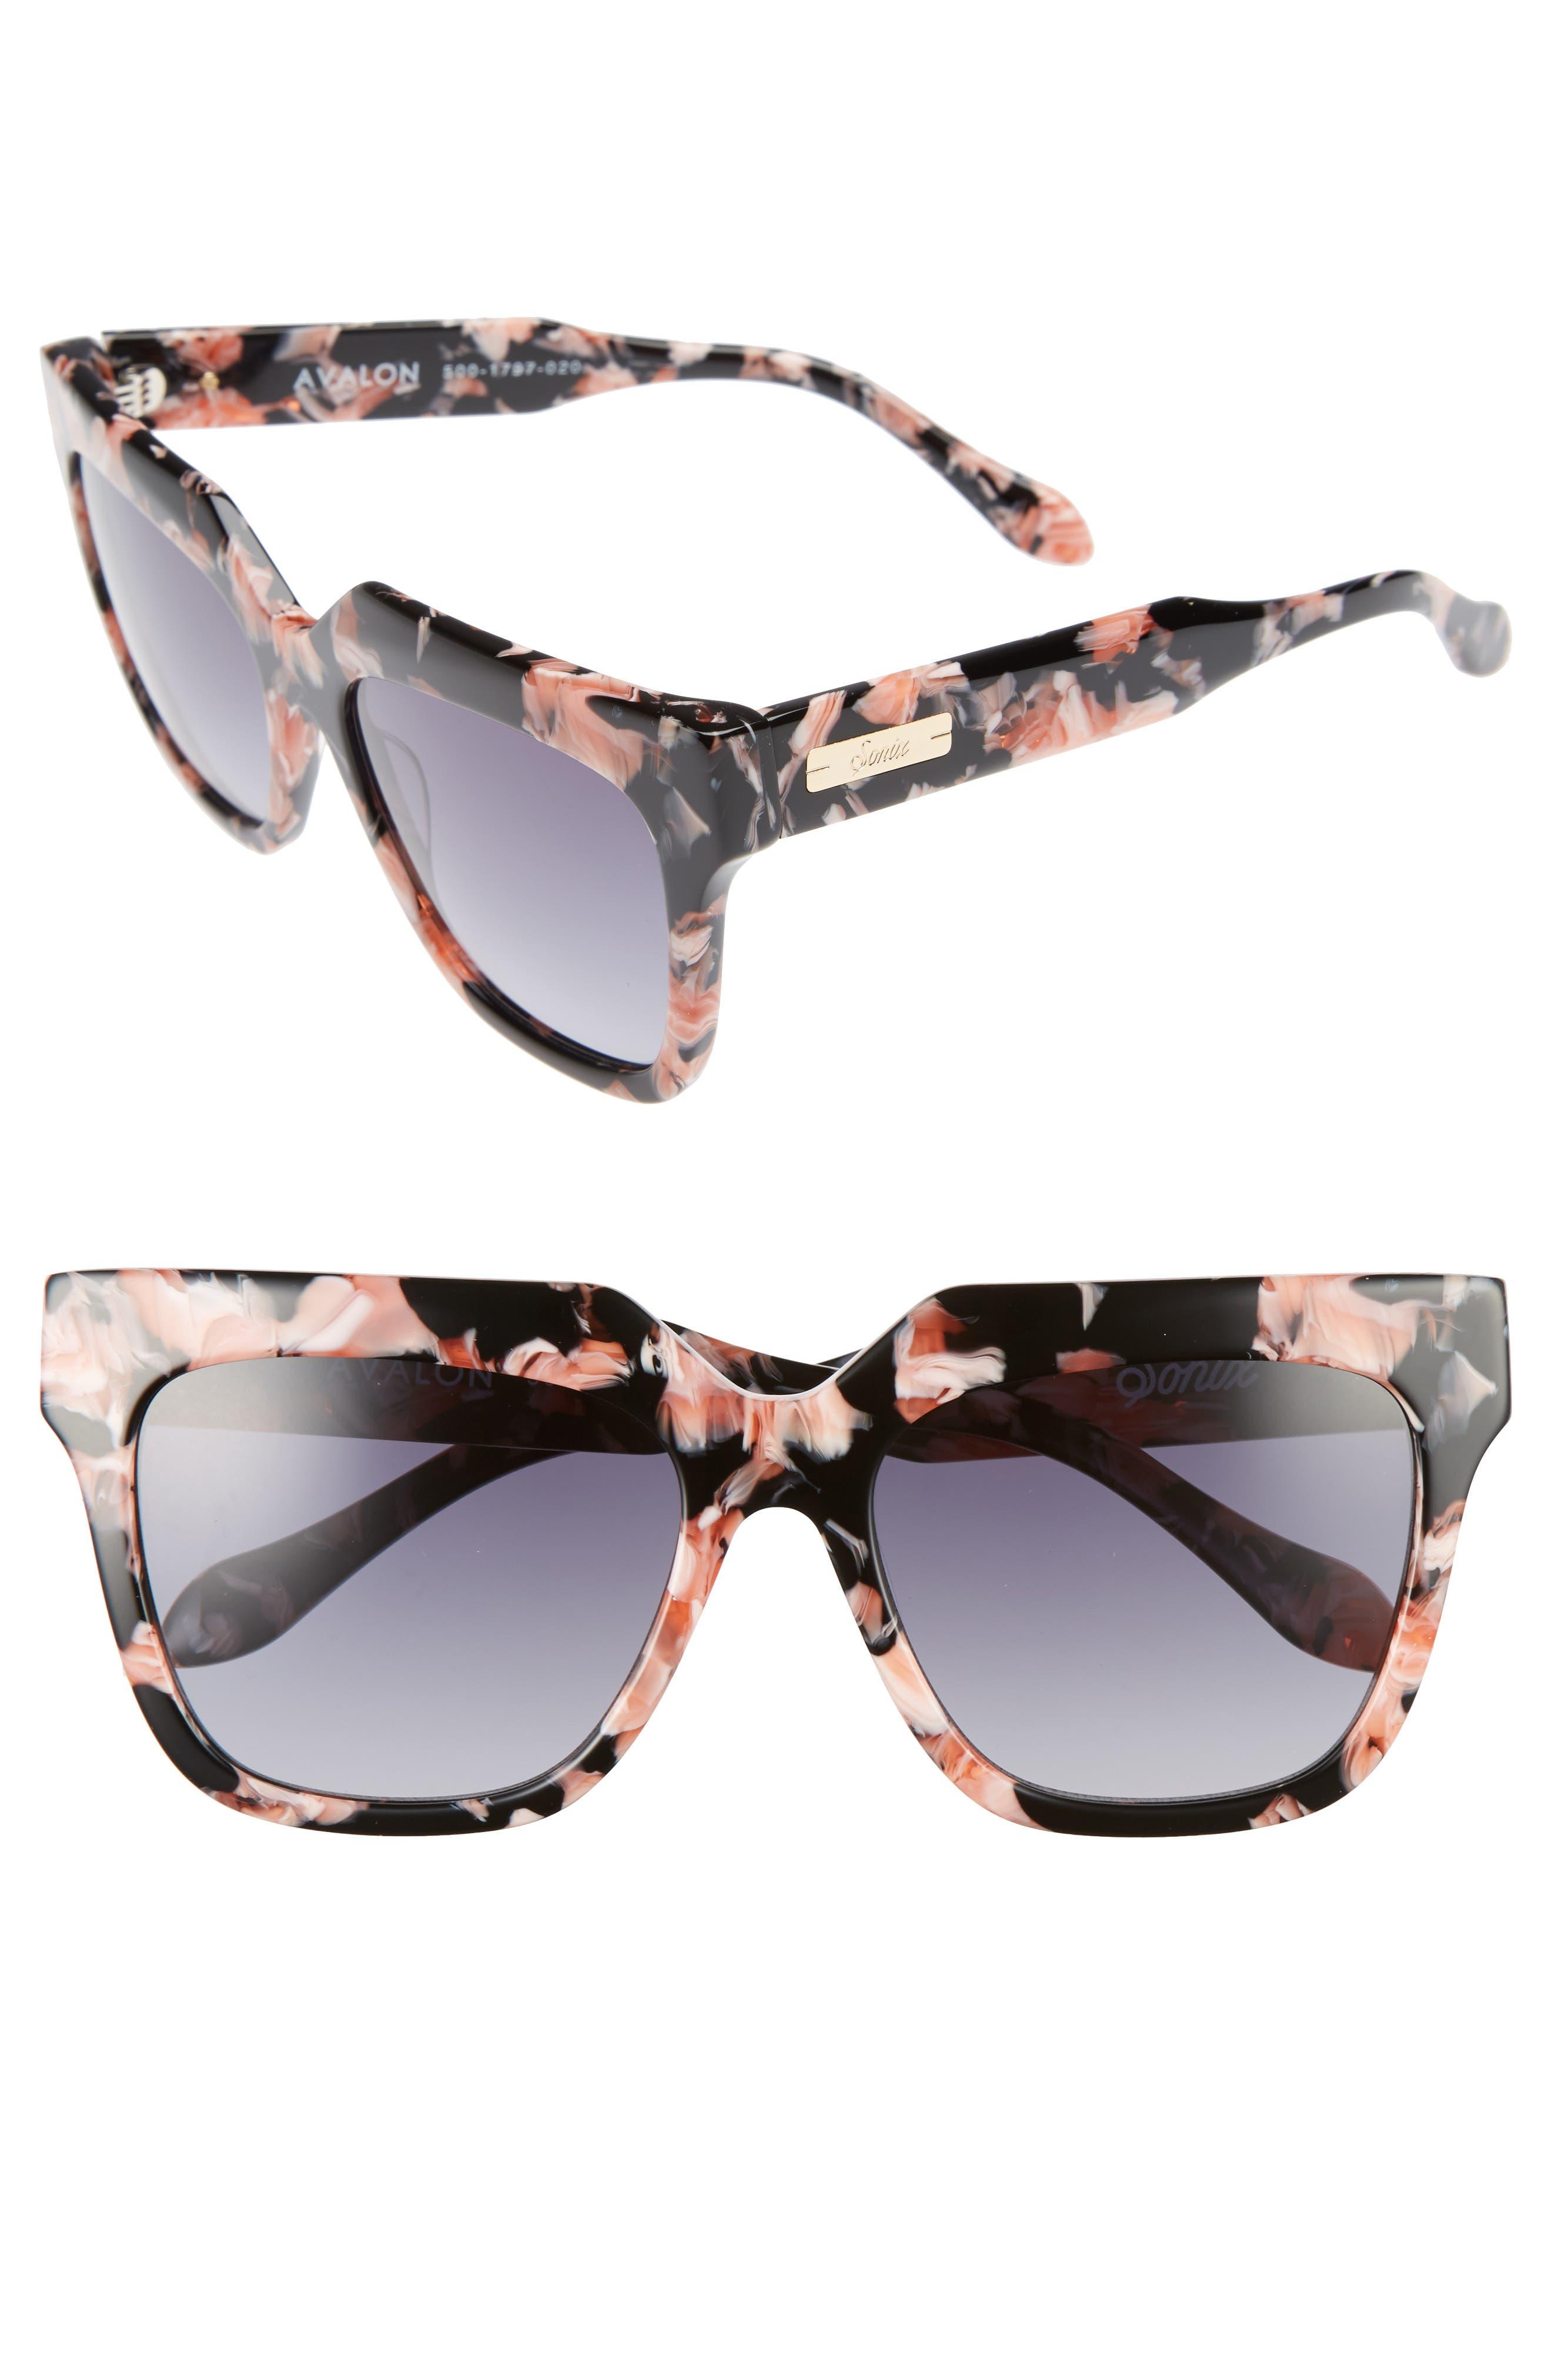 Avalon 57mm Retro Sunglasses,                         Main,                         color, Rose Marble/ Black Fade